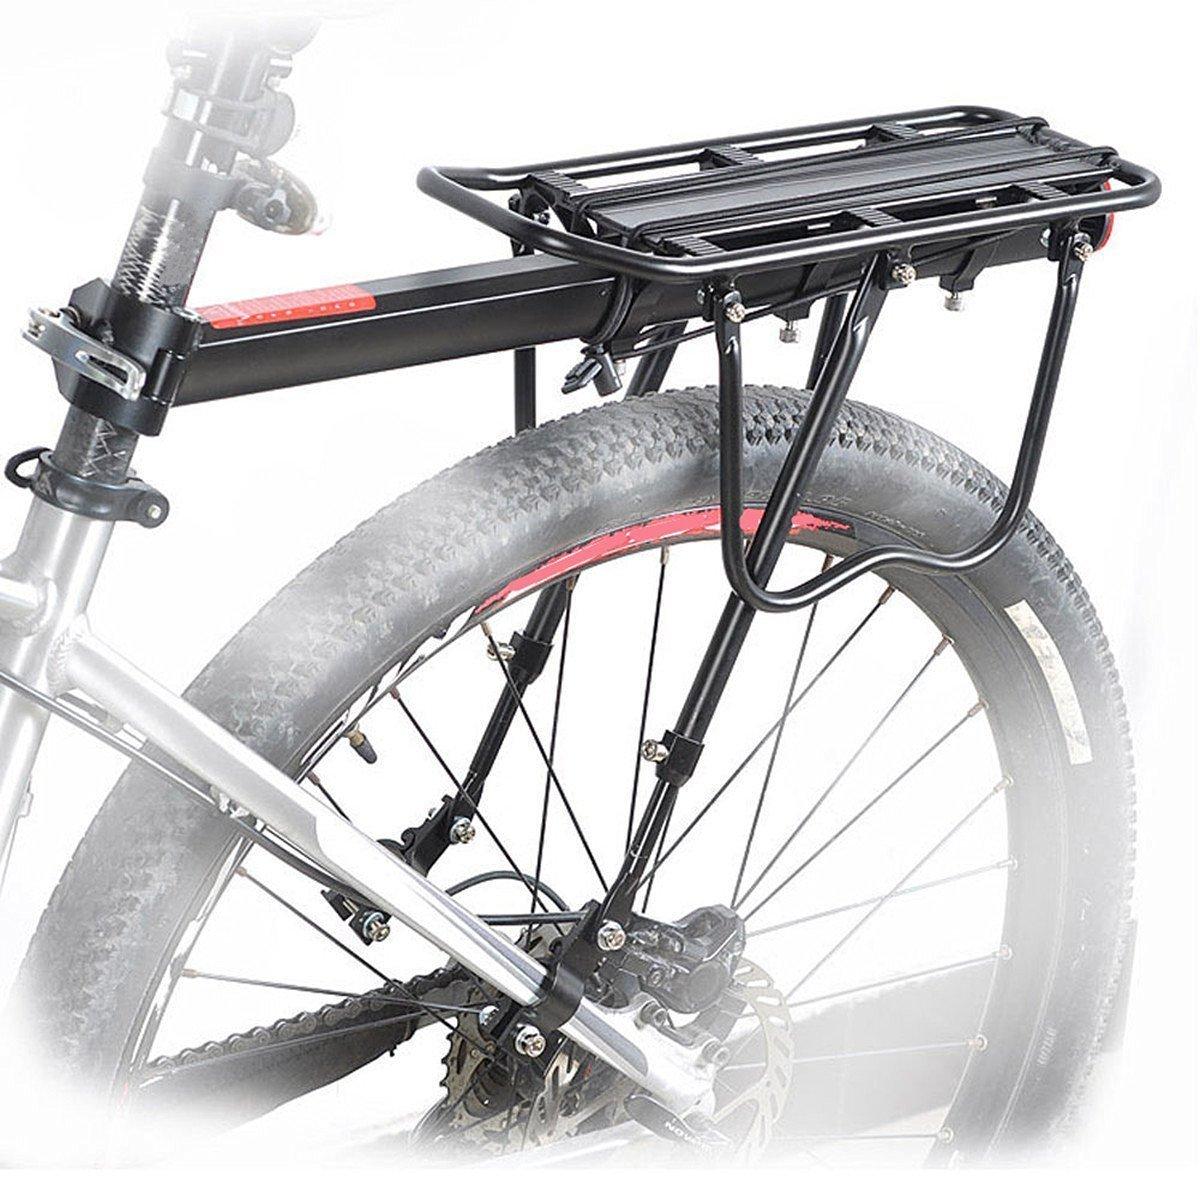 Yaetek Bike Wall Mount Rack Storage Hanger Garage Bicycle Holder Folding CA NEW